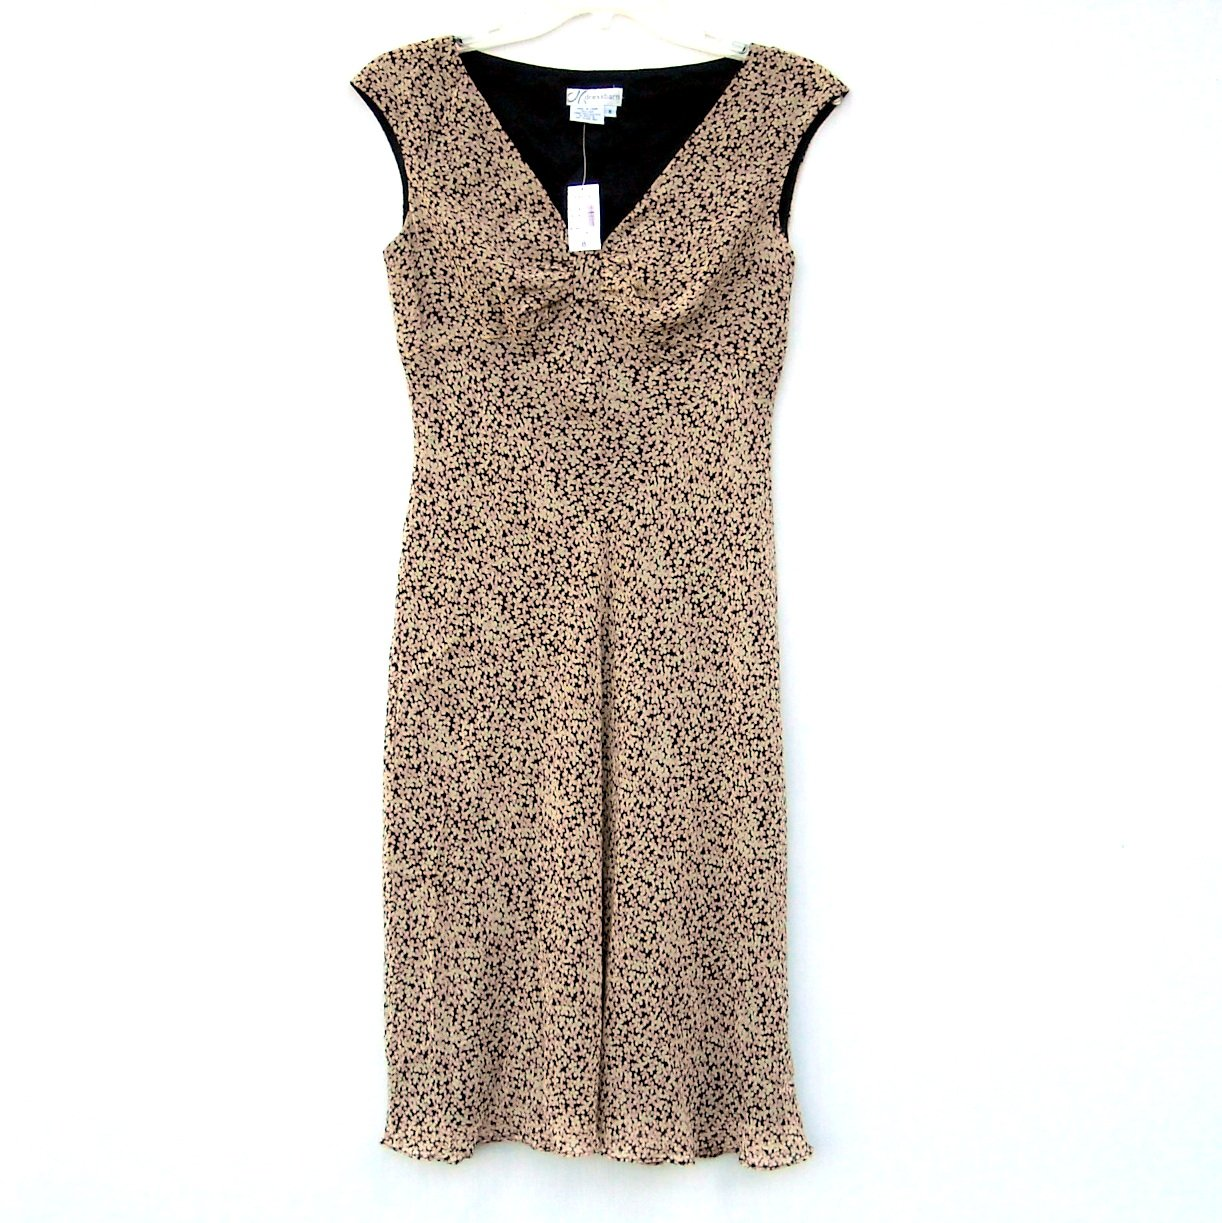 Dressbarn Misses Sleeveless Dress Size 8 NWT